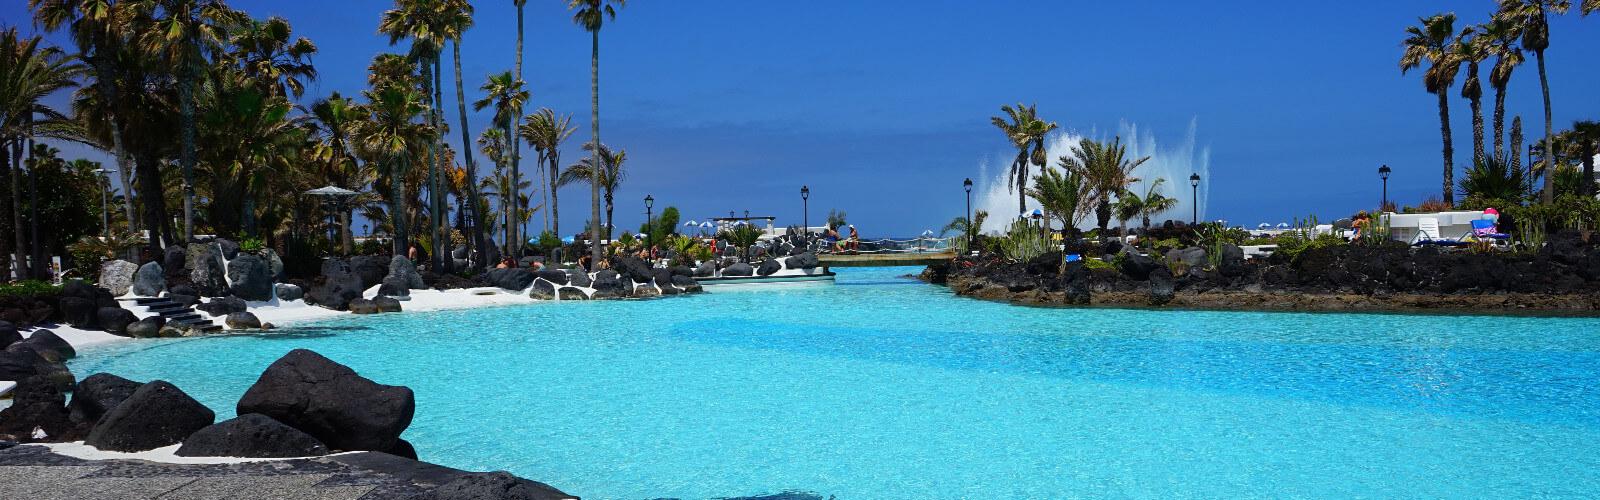 Aeroporto Tenerife Sud : Transfer aeroporto tenerife sud tfs sixt mydriver